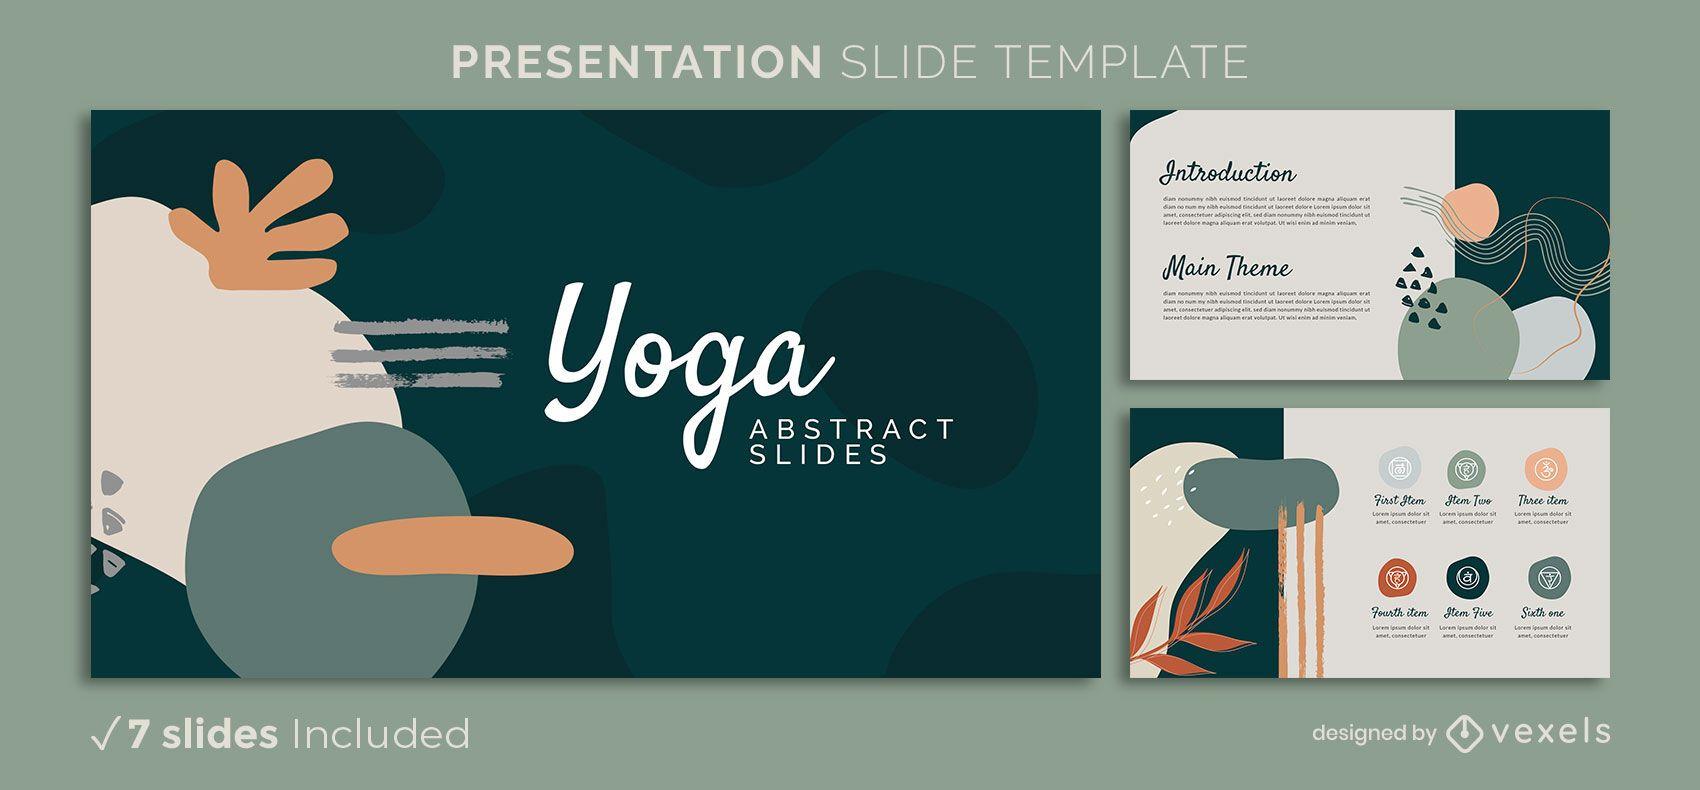 Yoga abstract presentation template